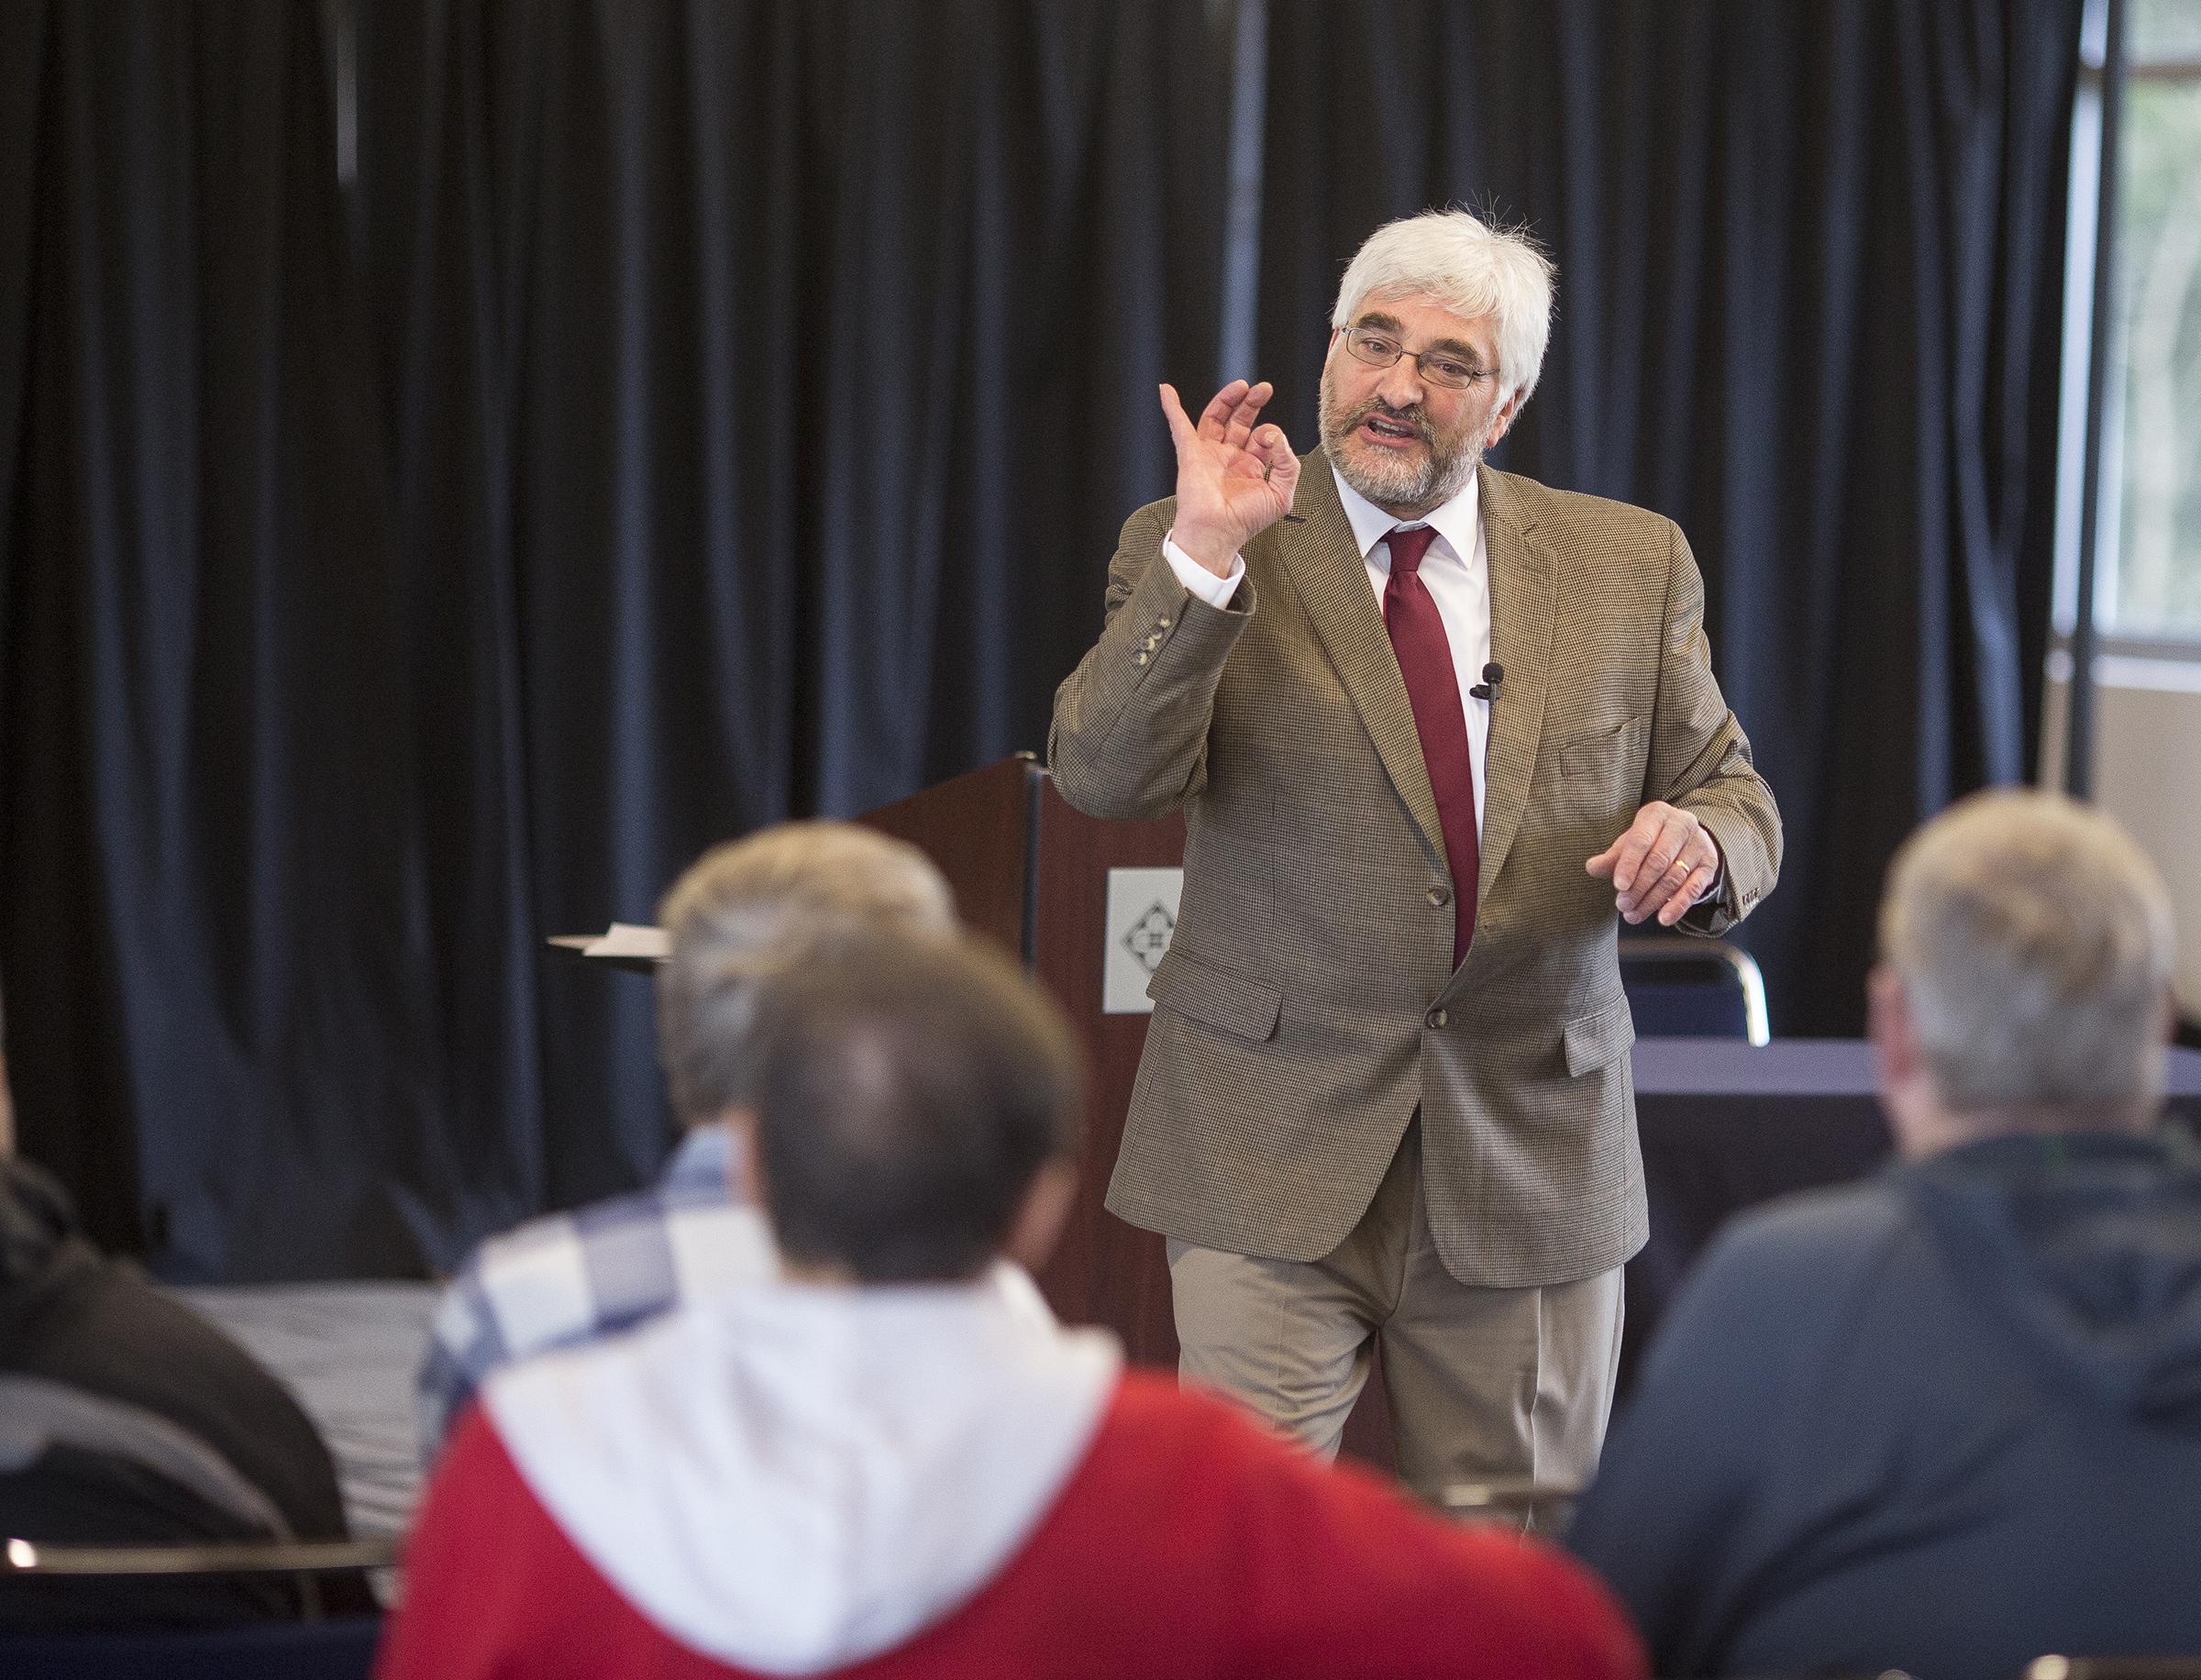 Ken Butigan speaking in Olympia, WA